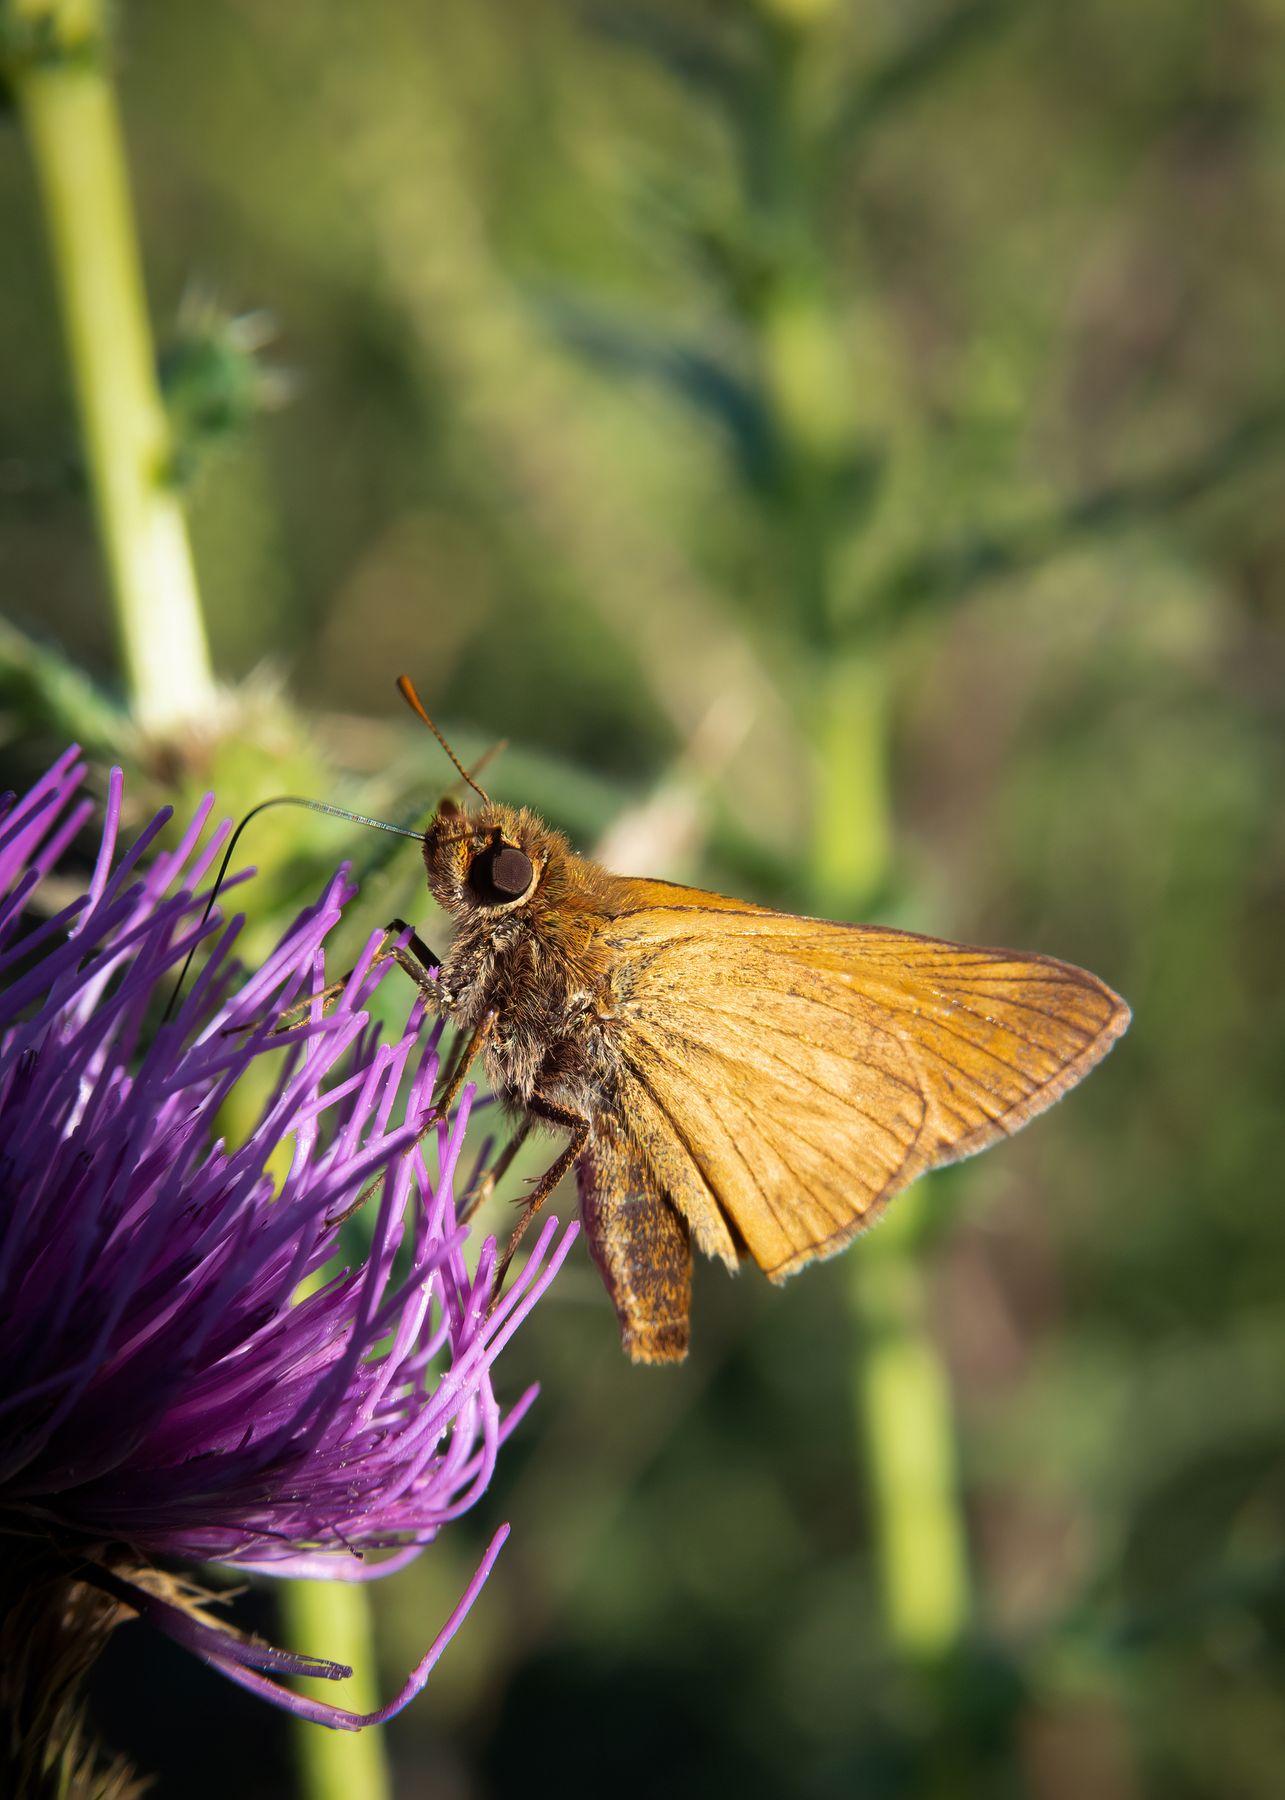 Малышка толстоголовка Толстовка бабочка